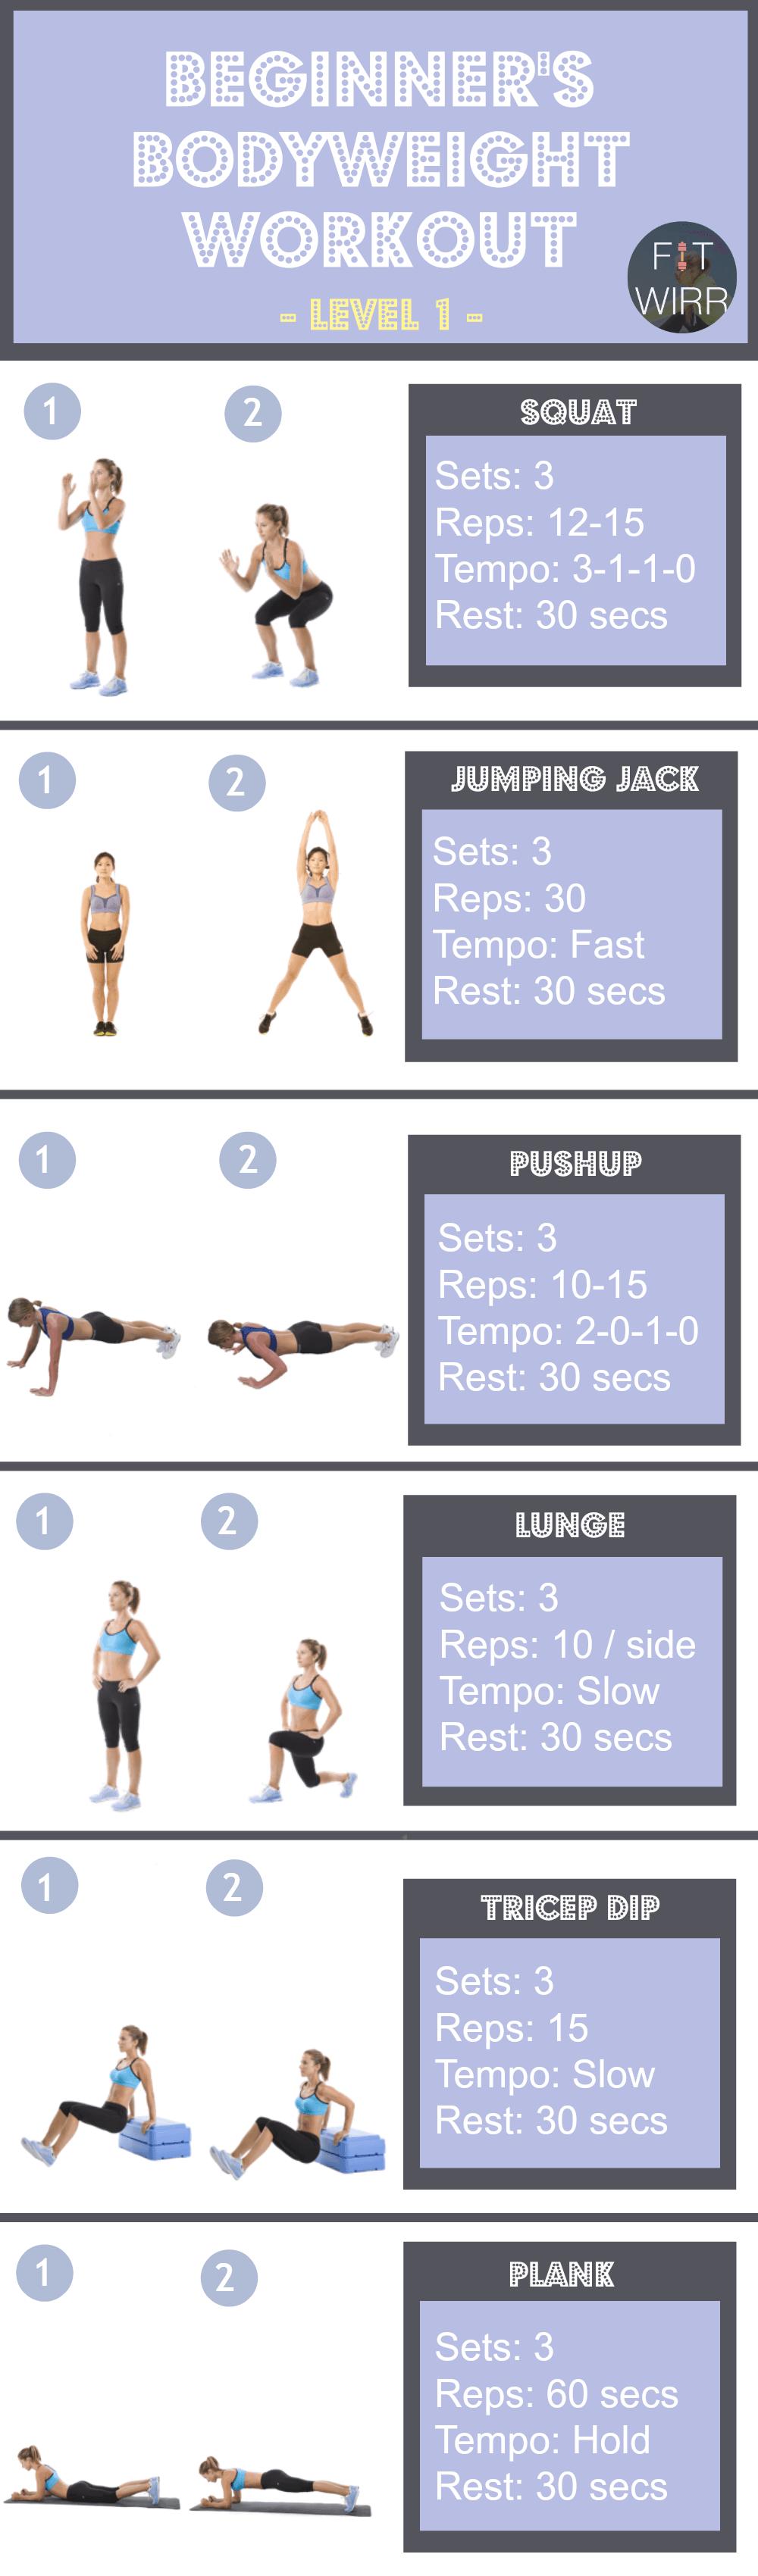 Beginner's Bodyweight HIIT Workout for Women | my life ...